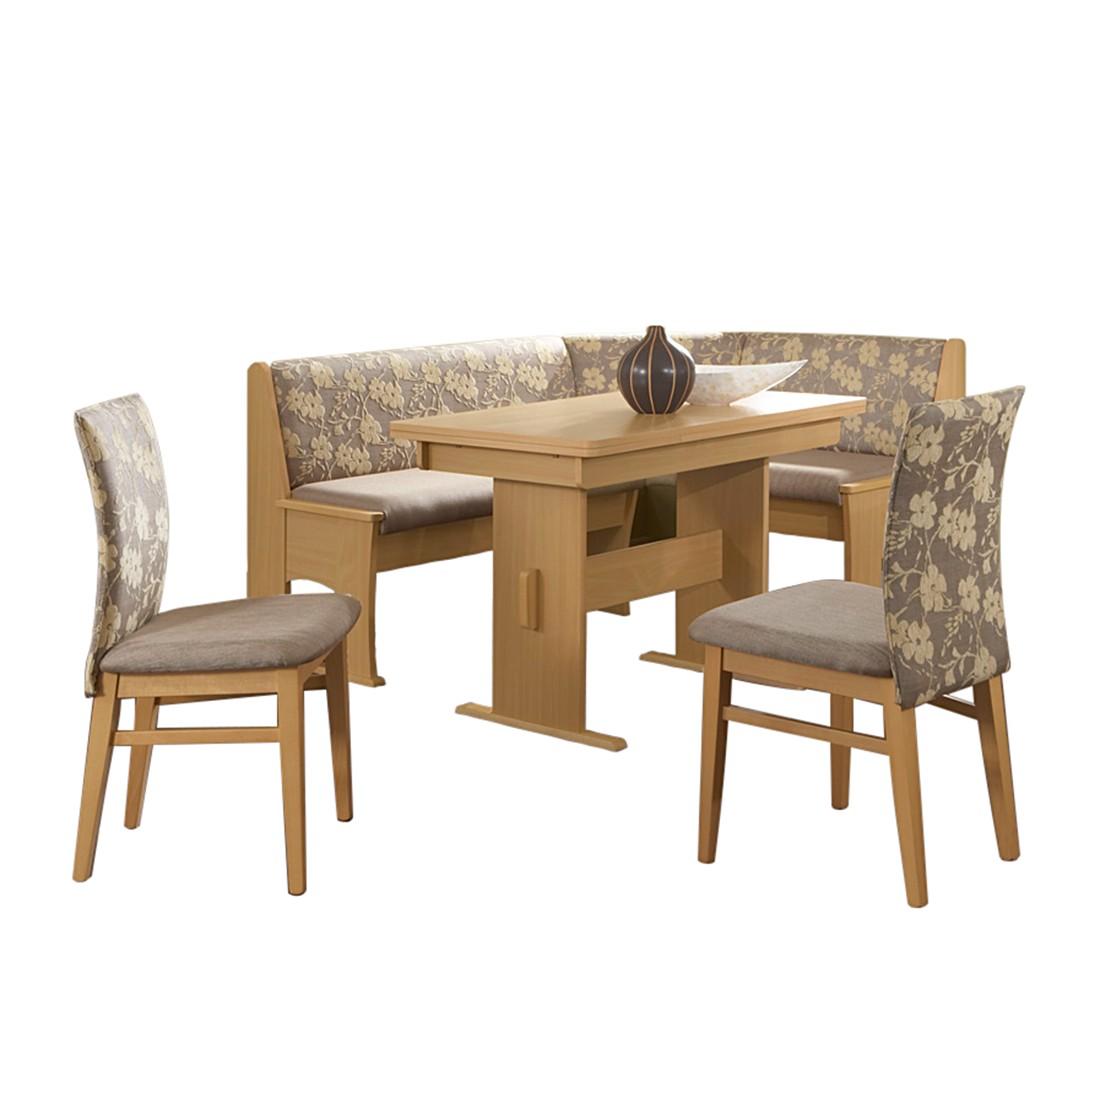 eckbankgruppe sven dekor buche california kaufen. Black Bedroom Furniture Sets. Home Design Ideas